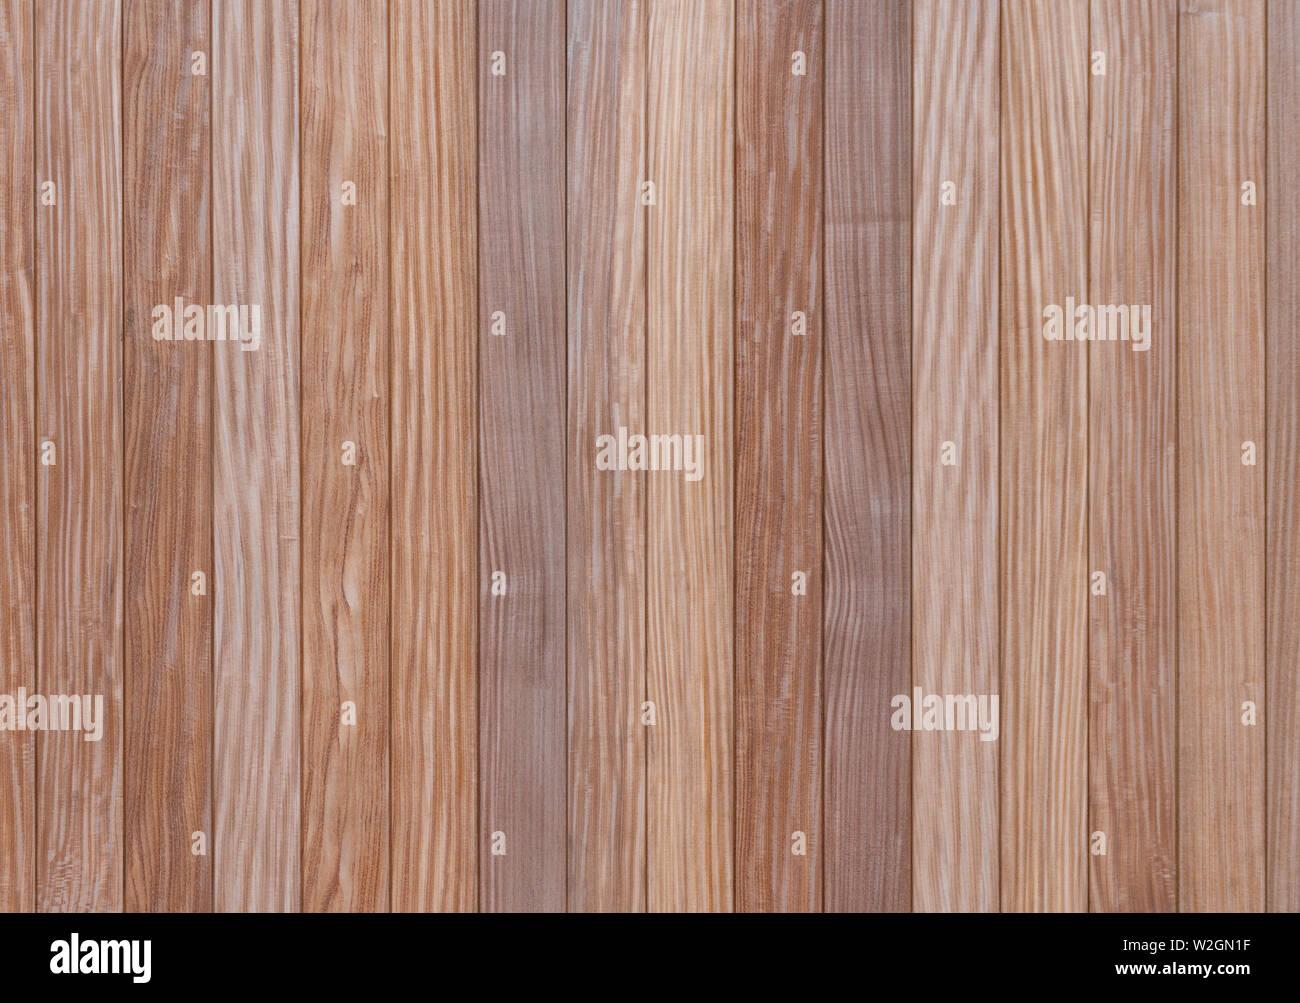 Wood texture background, wood plank flooring surface - Stock Image